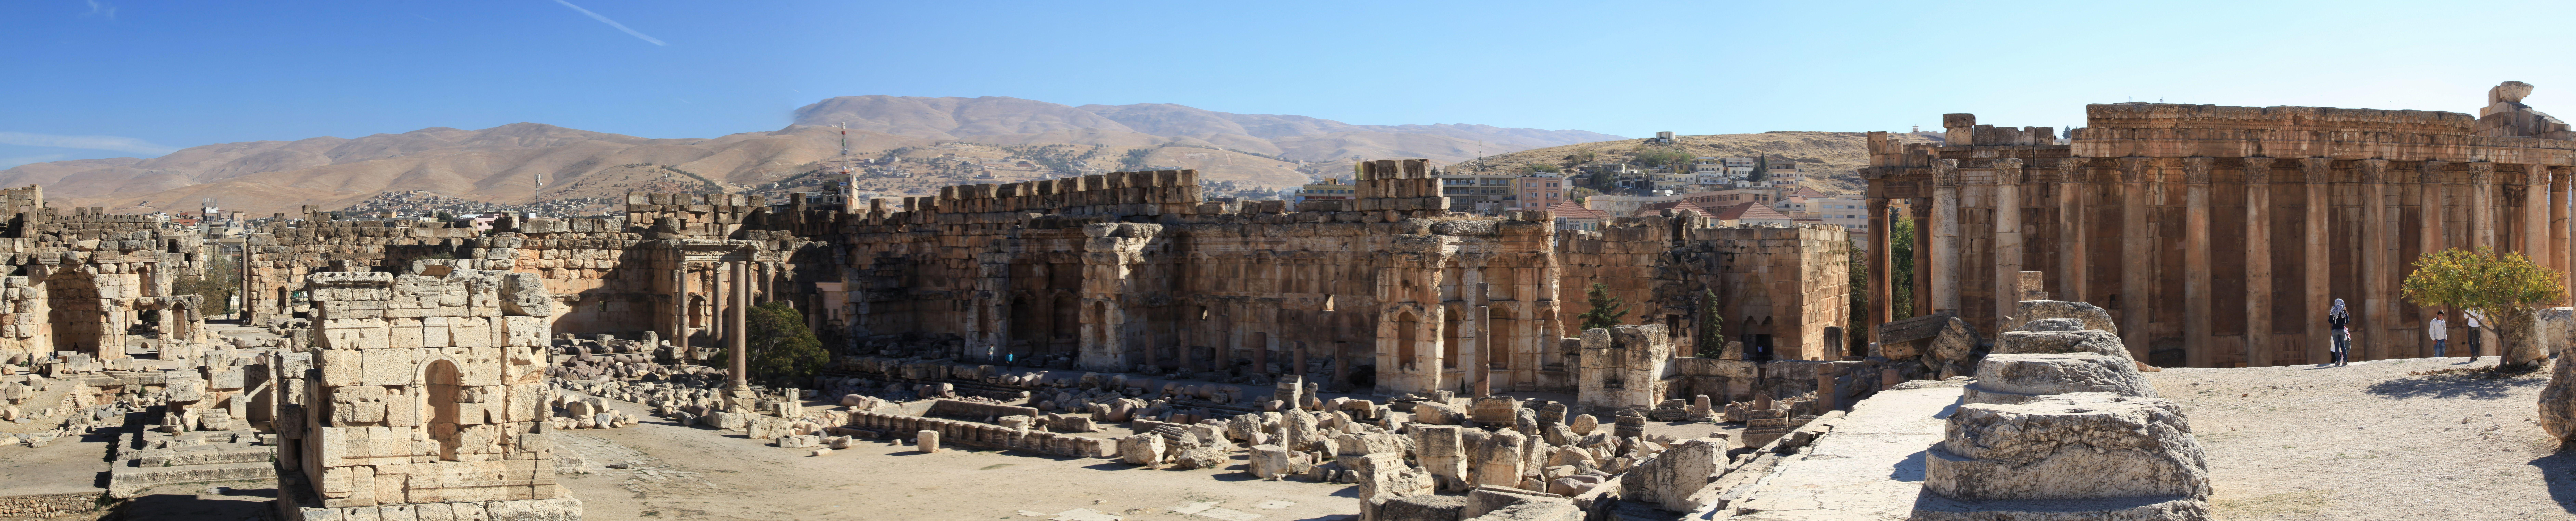 https://www.google.com/search?q=panorama ruins